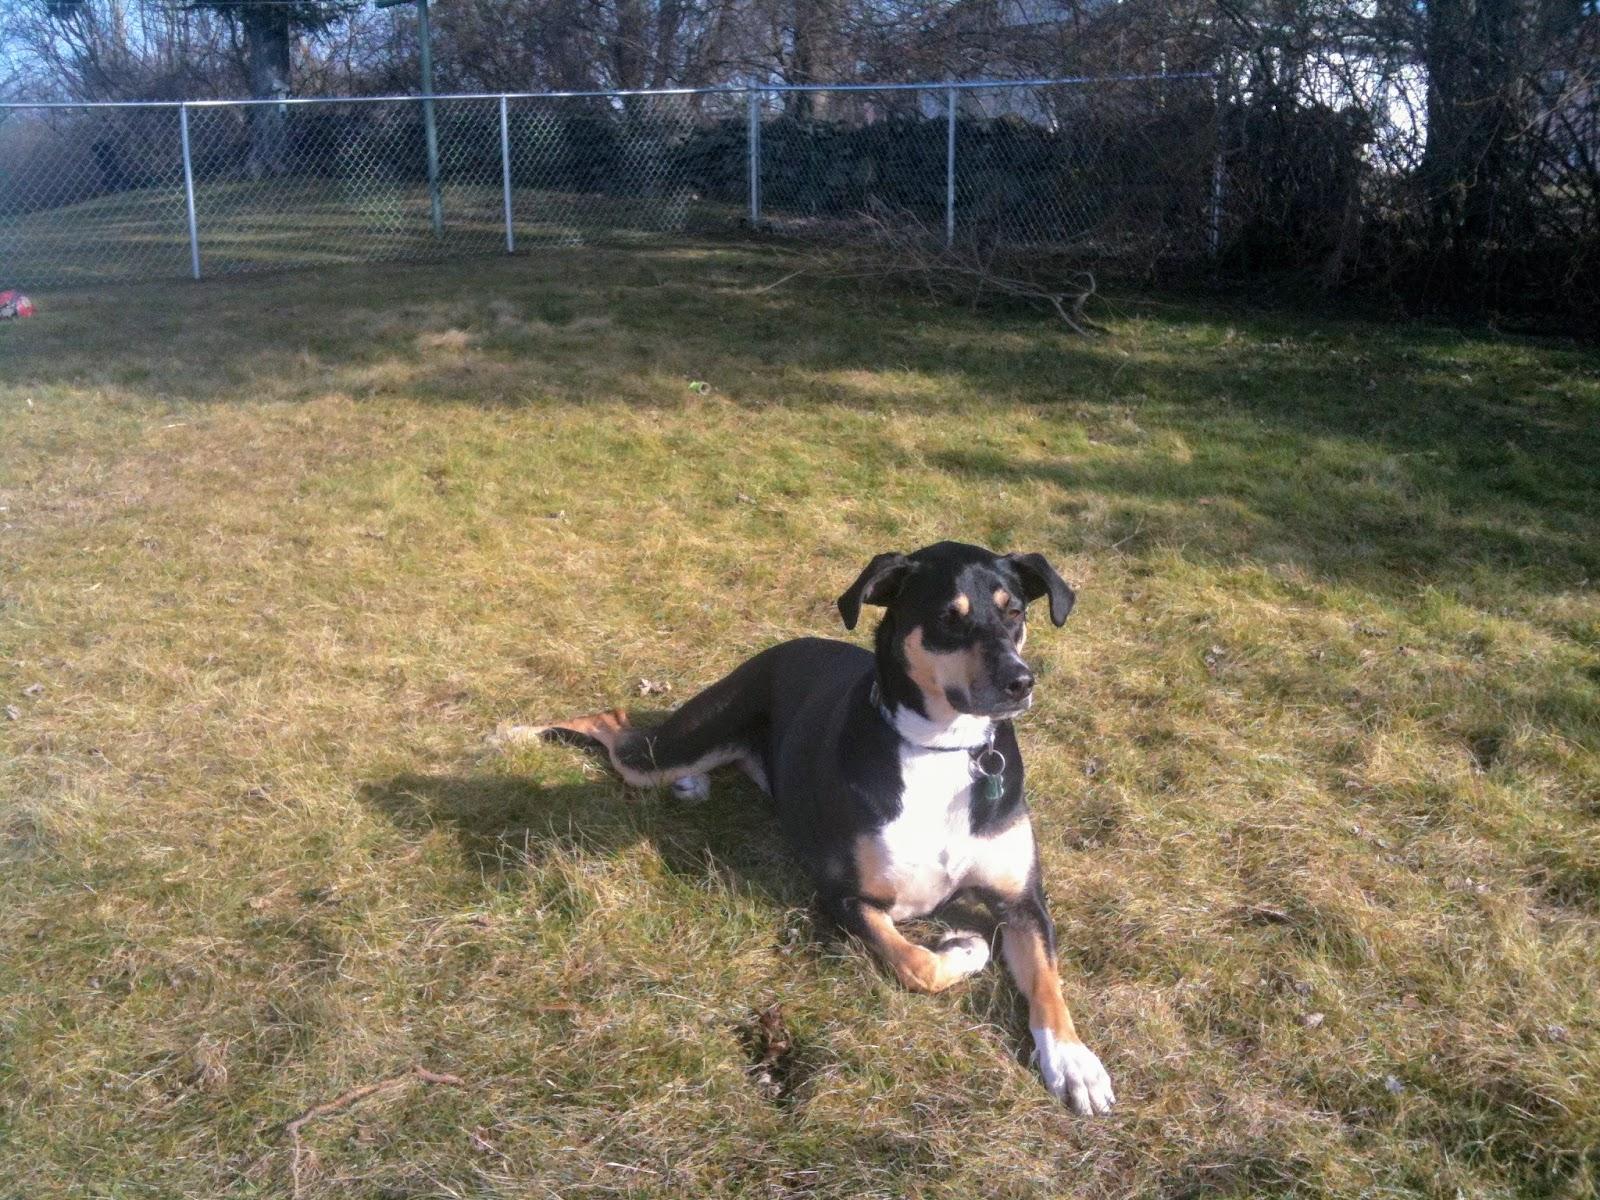 Roxy is enjoying the sun in her new fenced in backyard!